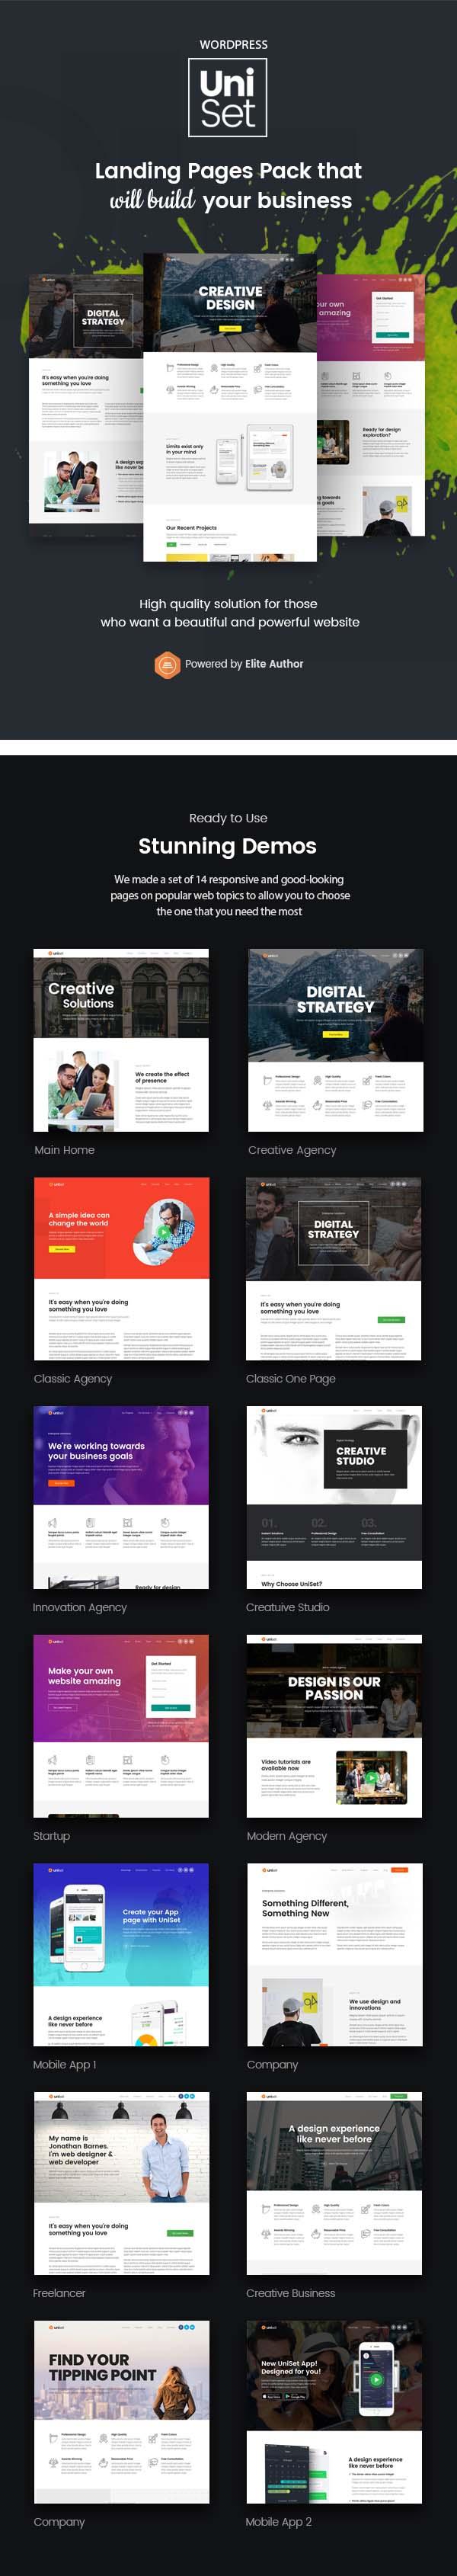 UniSet - Landing Page WordPress Theme by Jthemes | ThemeForest